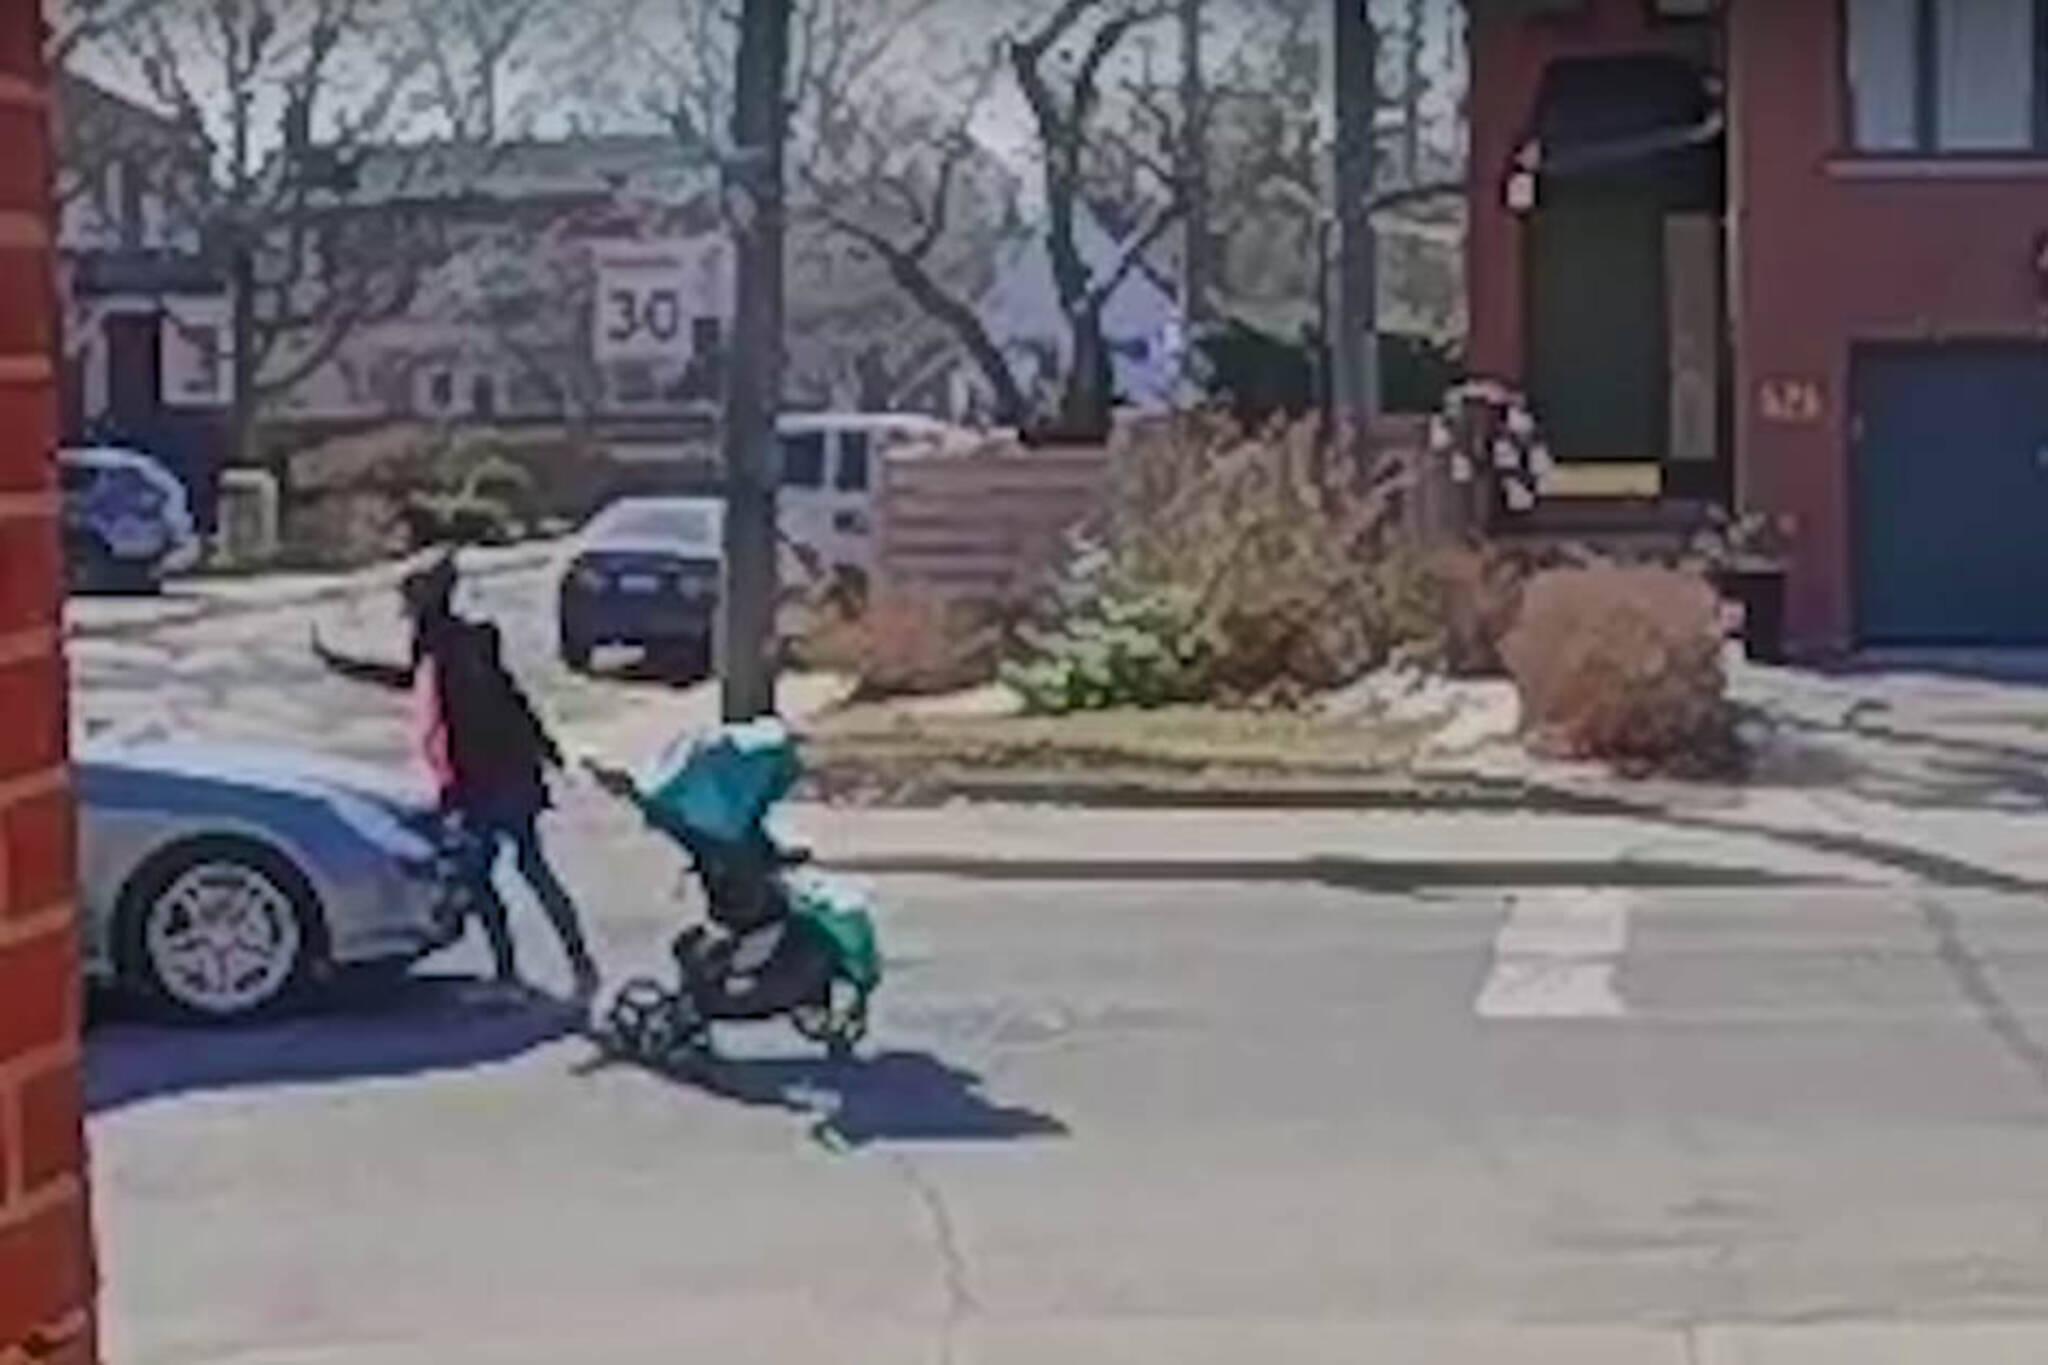 stroller video toronto